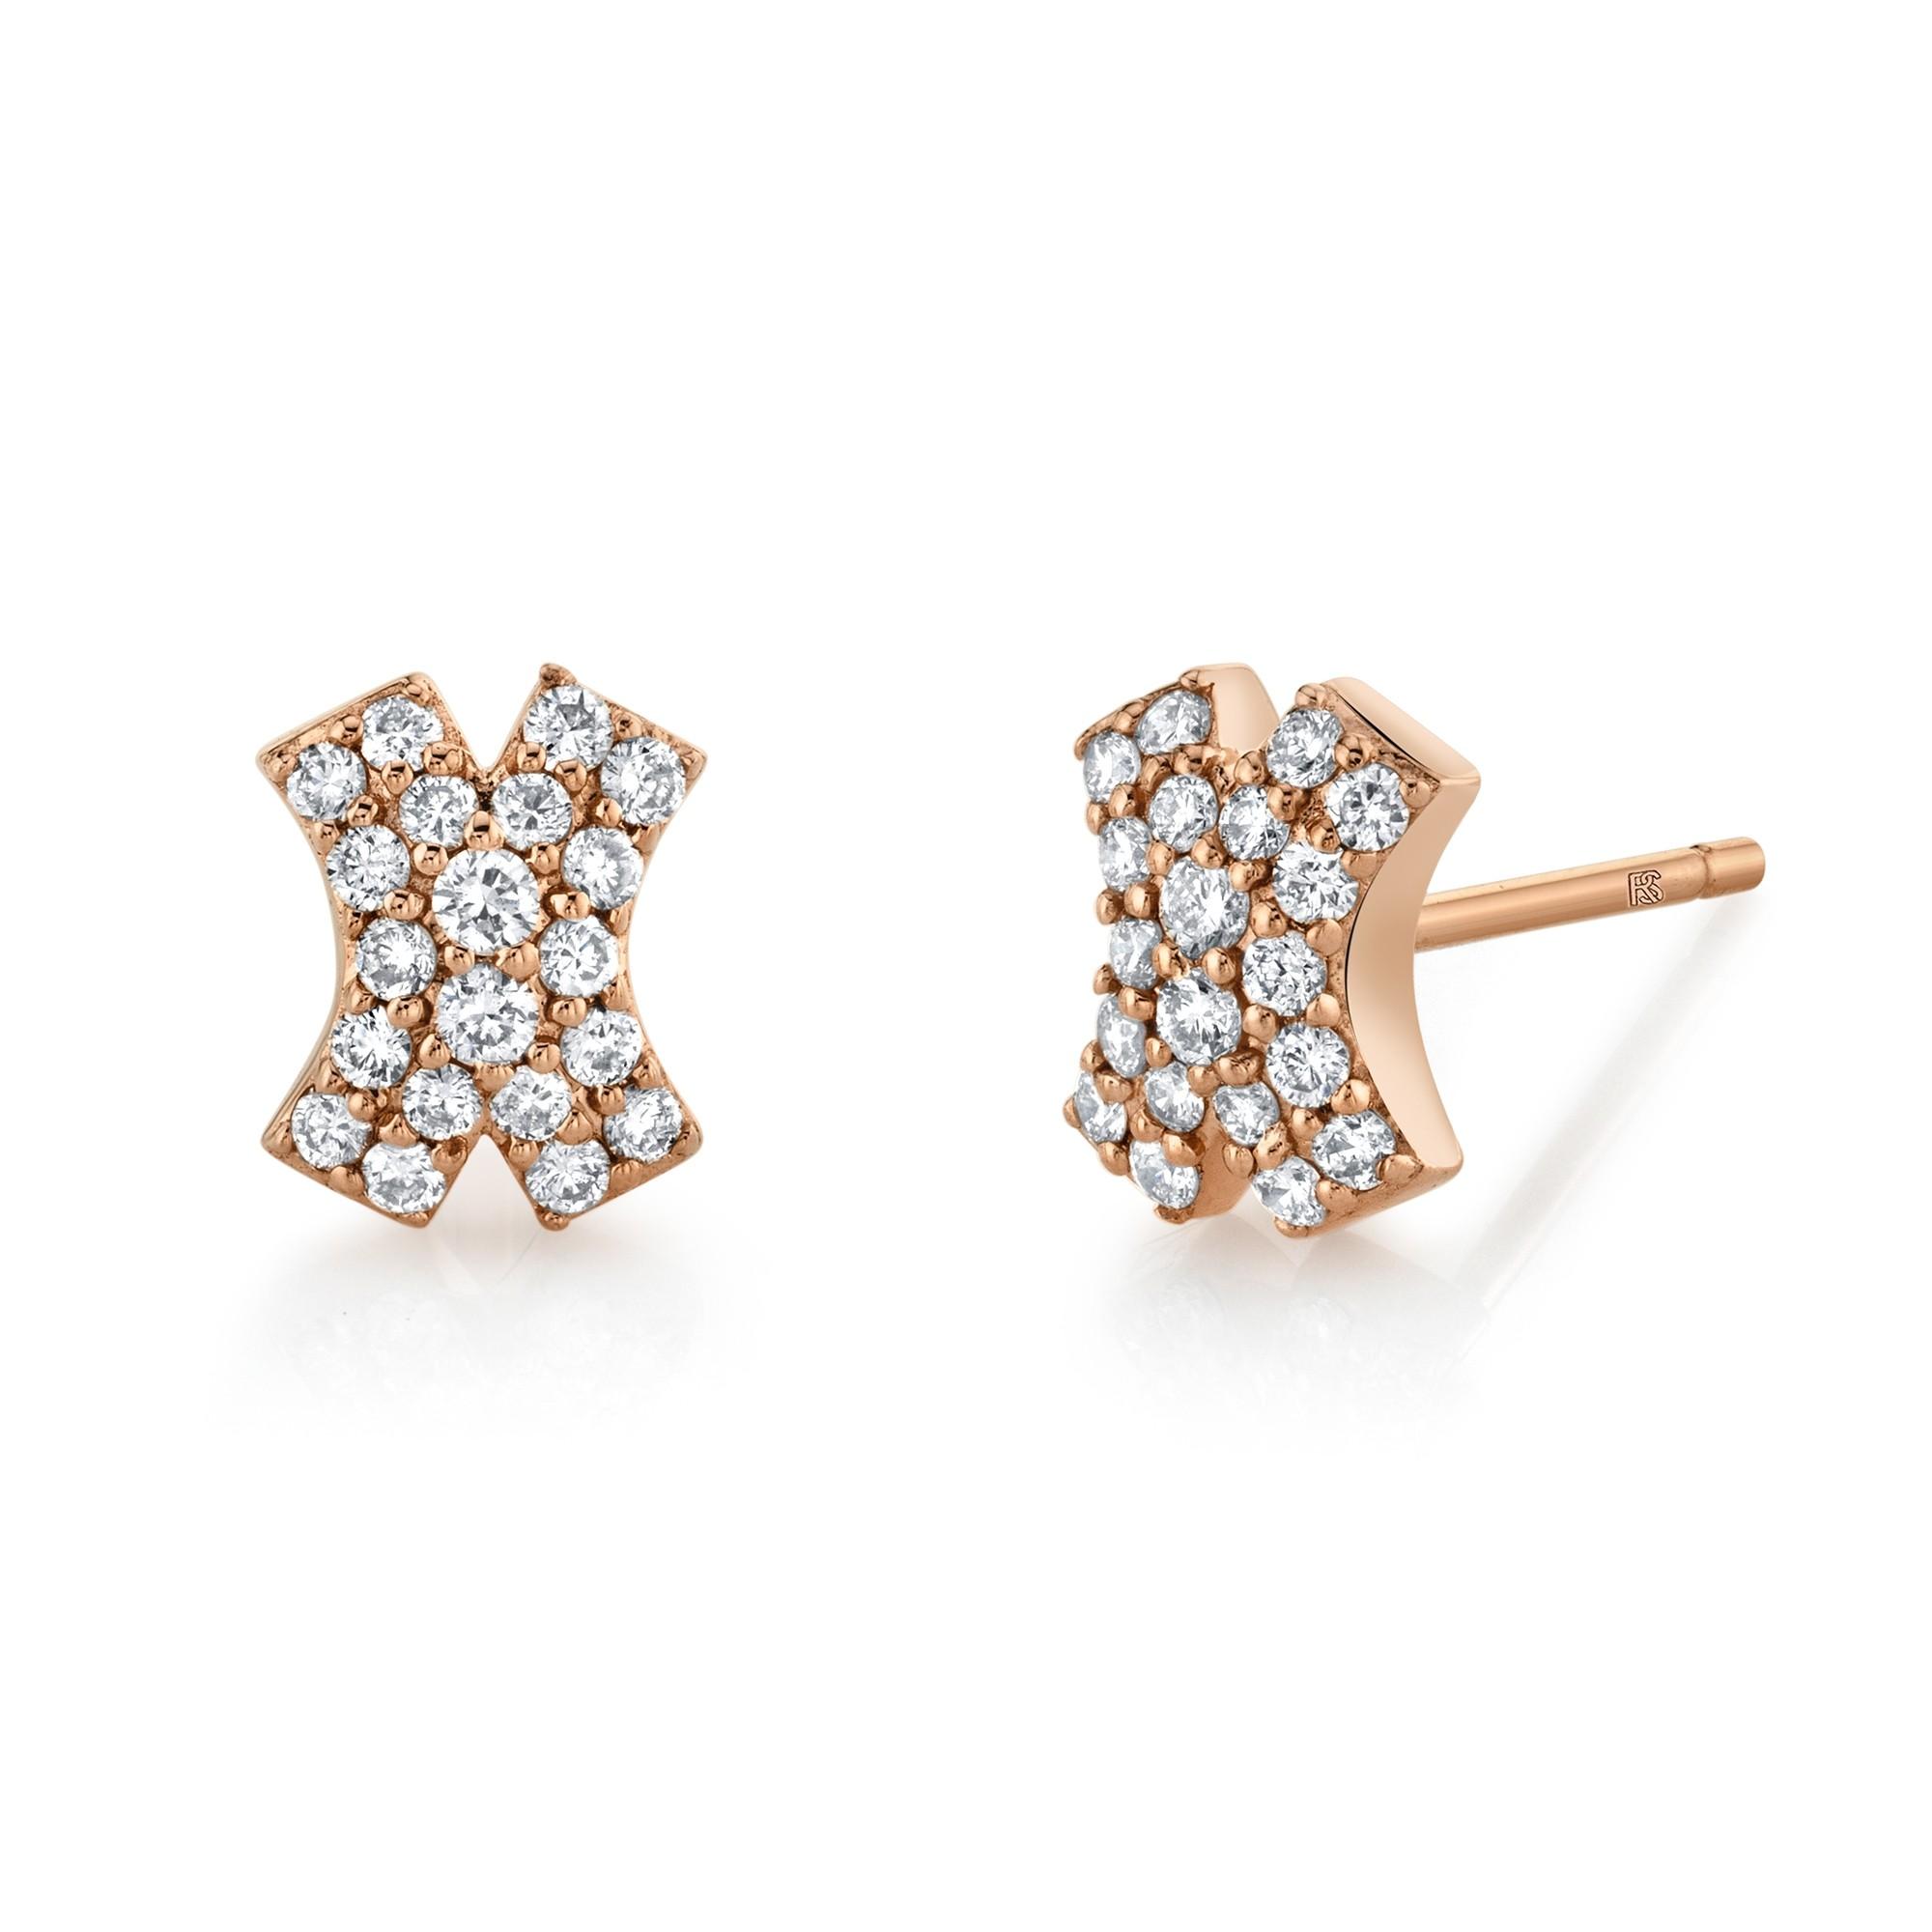 14k Rose Gold Diamond Pave X Earrings